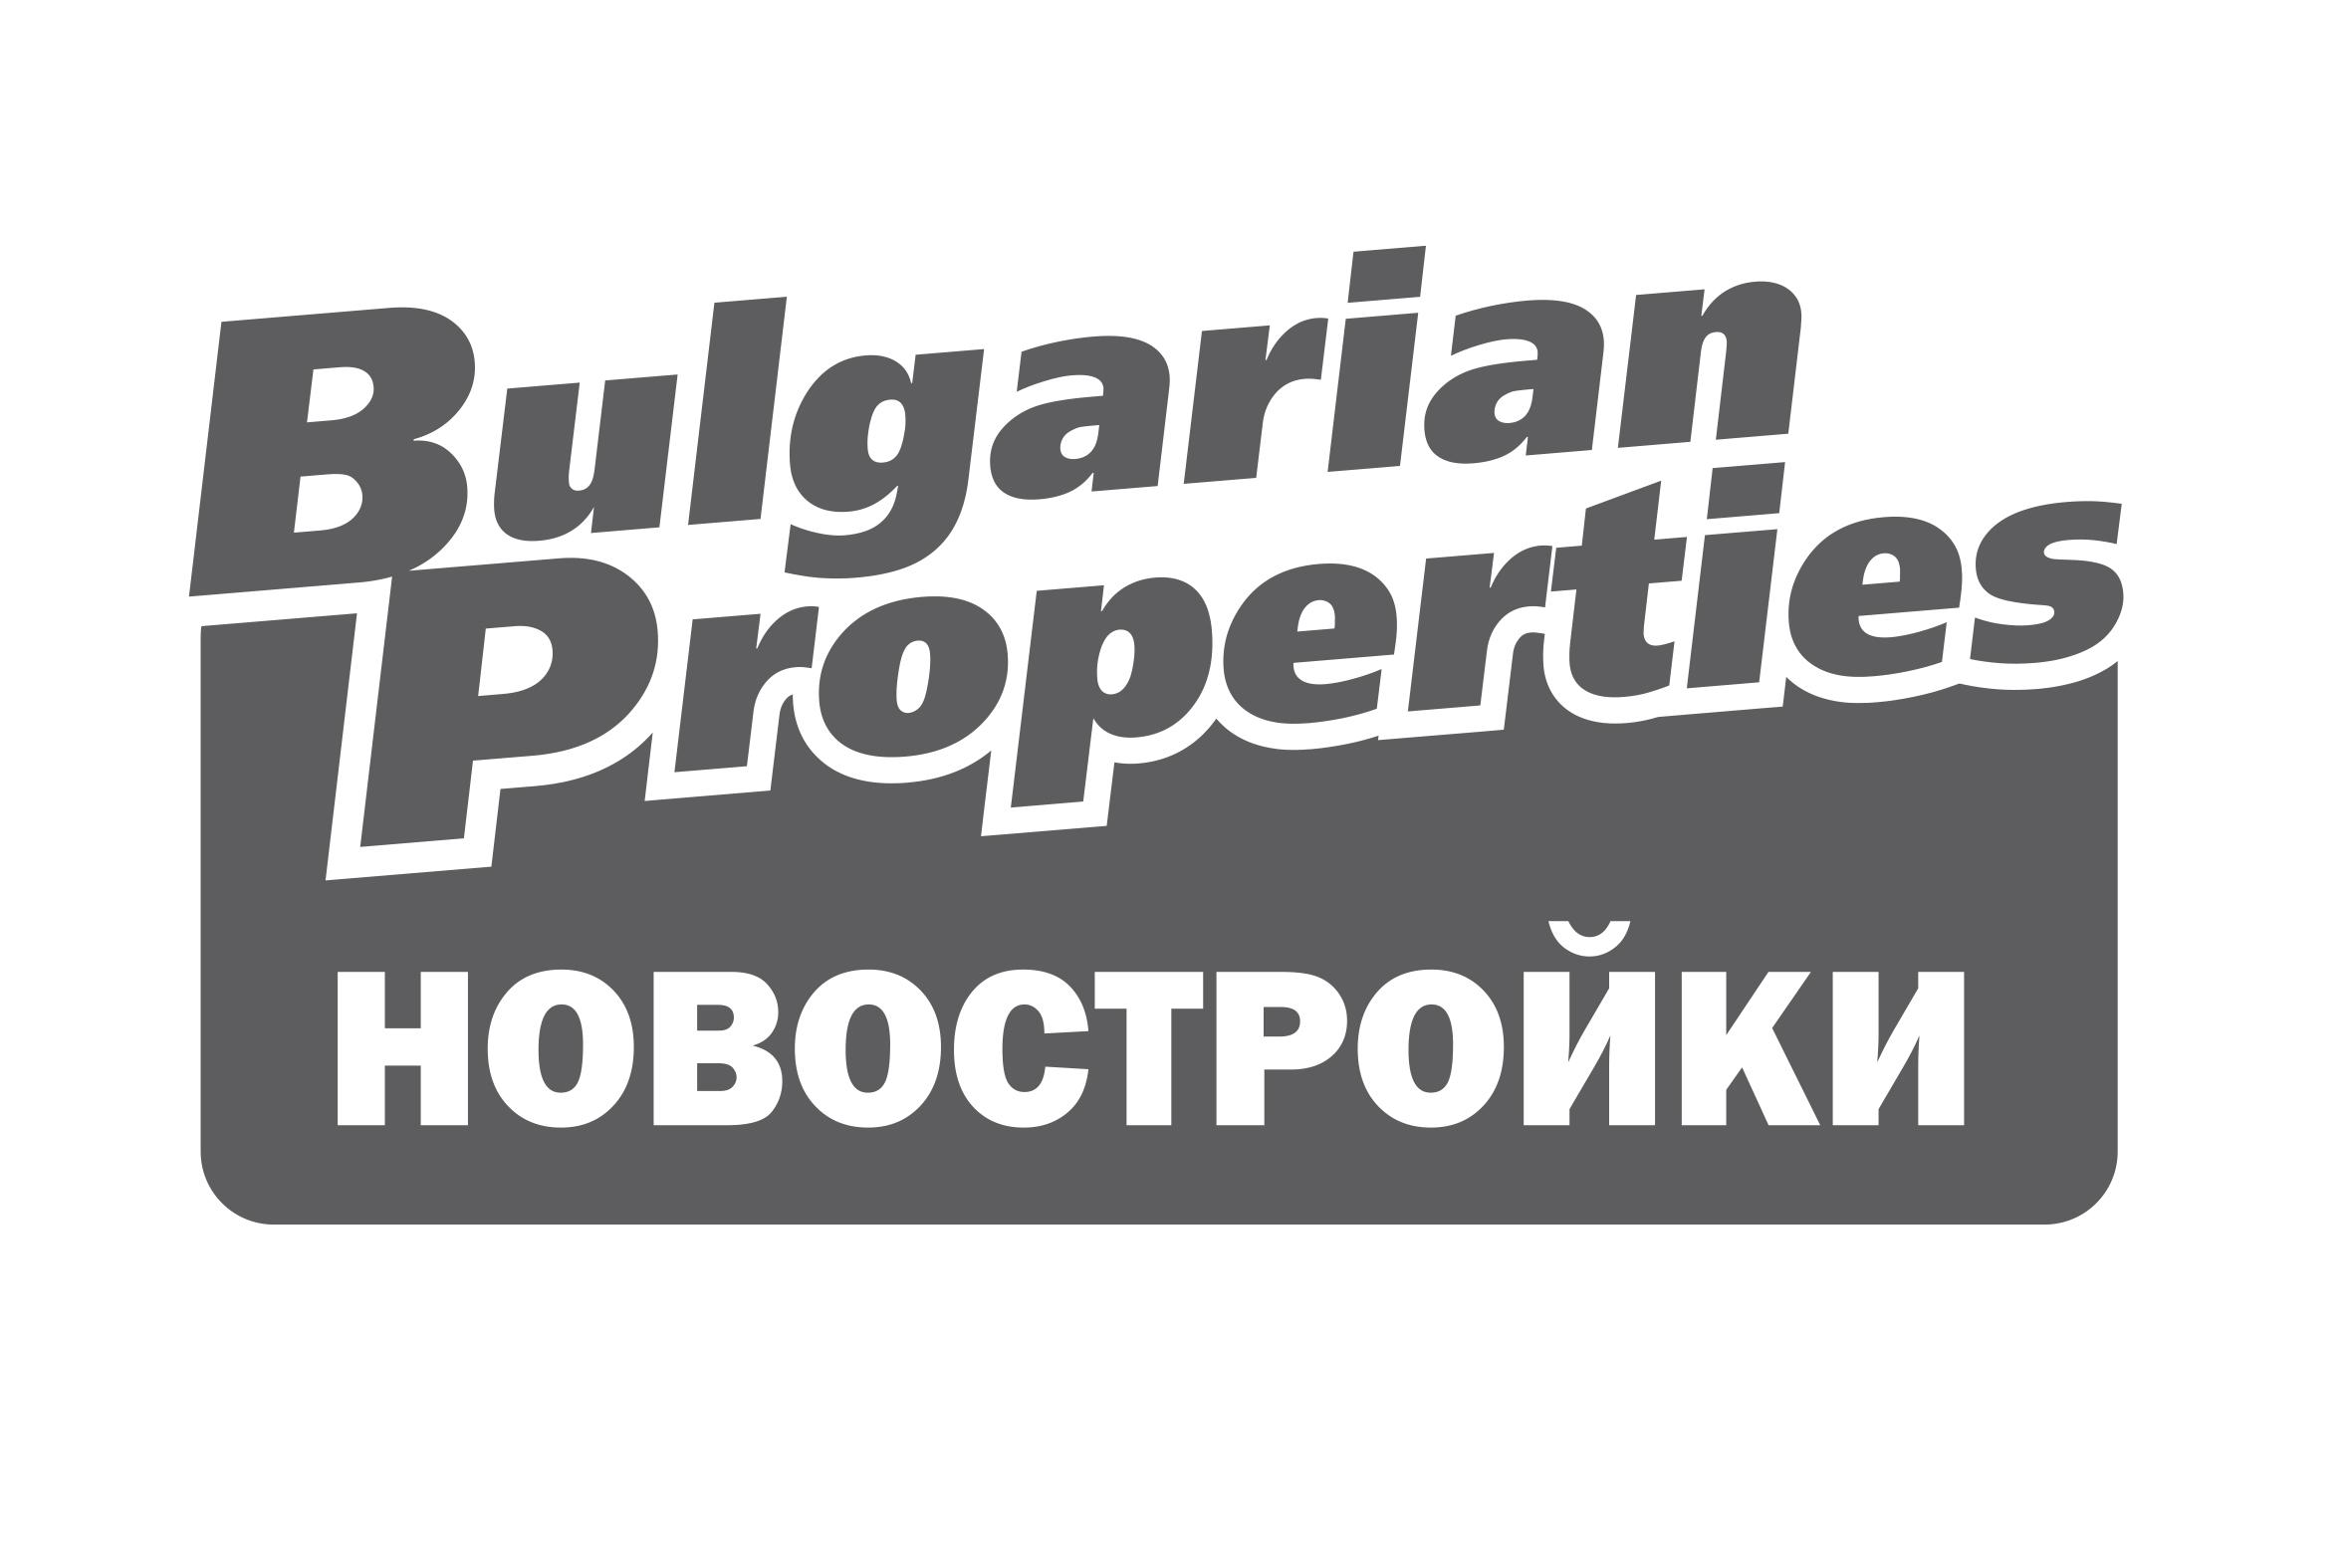 tur v bolgariju nesebr 20 559 rub chel.jpg charsetbinary nameBP1 - Тур в Болгарию Несебр 20 559 руб. чел.